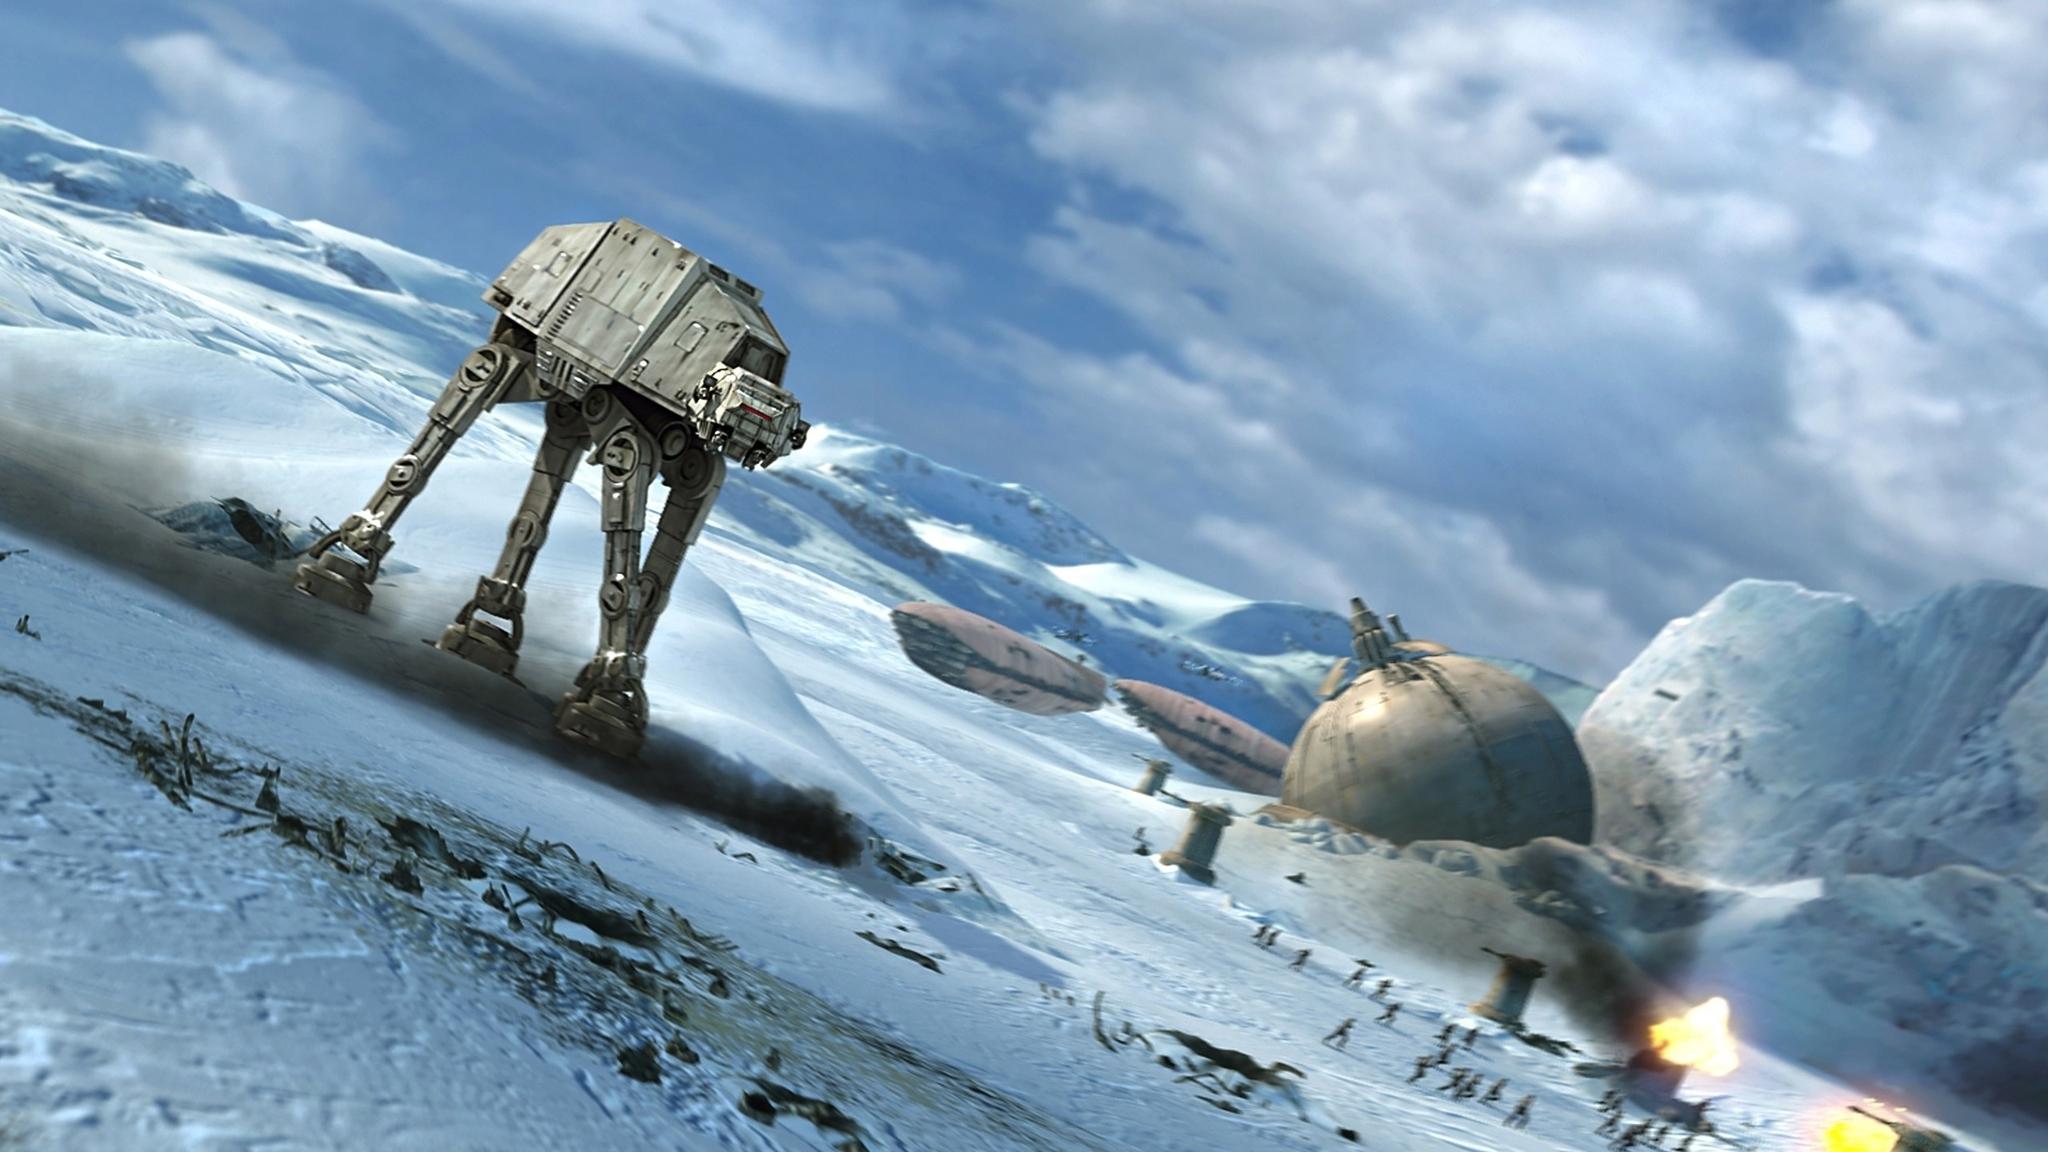 Star wars hoth battles atat (2048x1152)